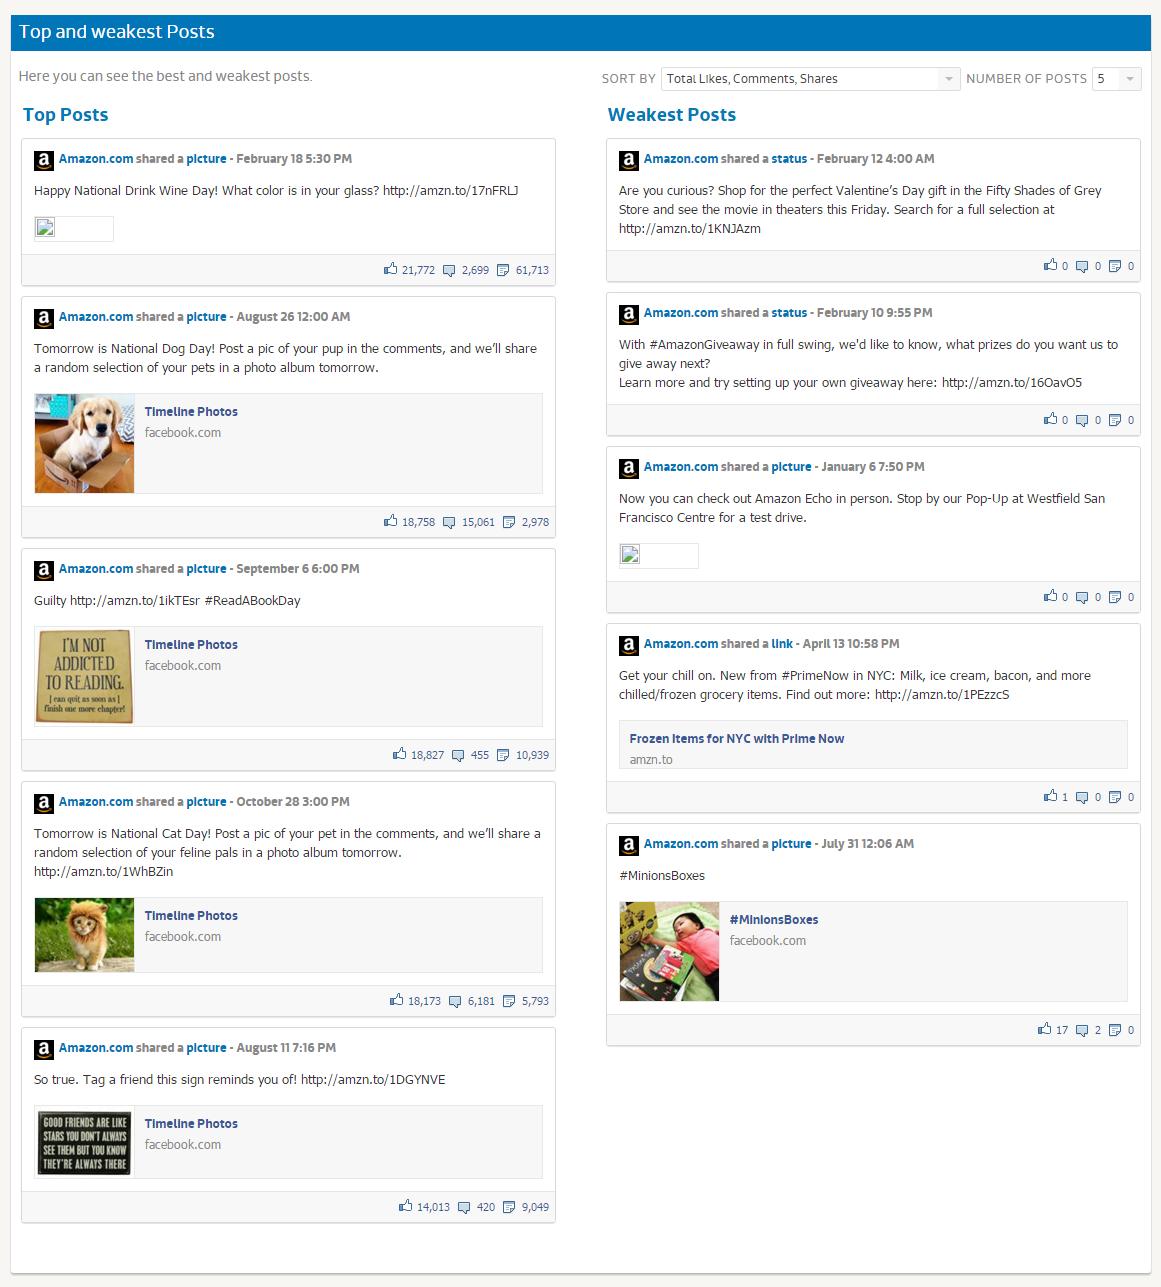 Media Research - Amazon on FB (3)